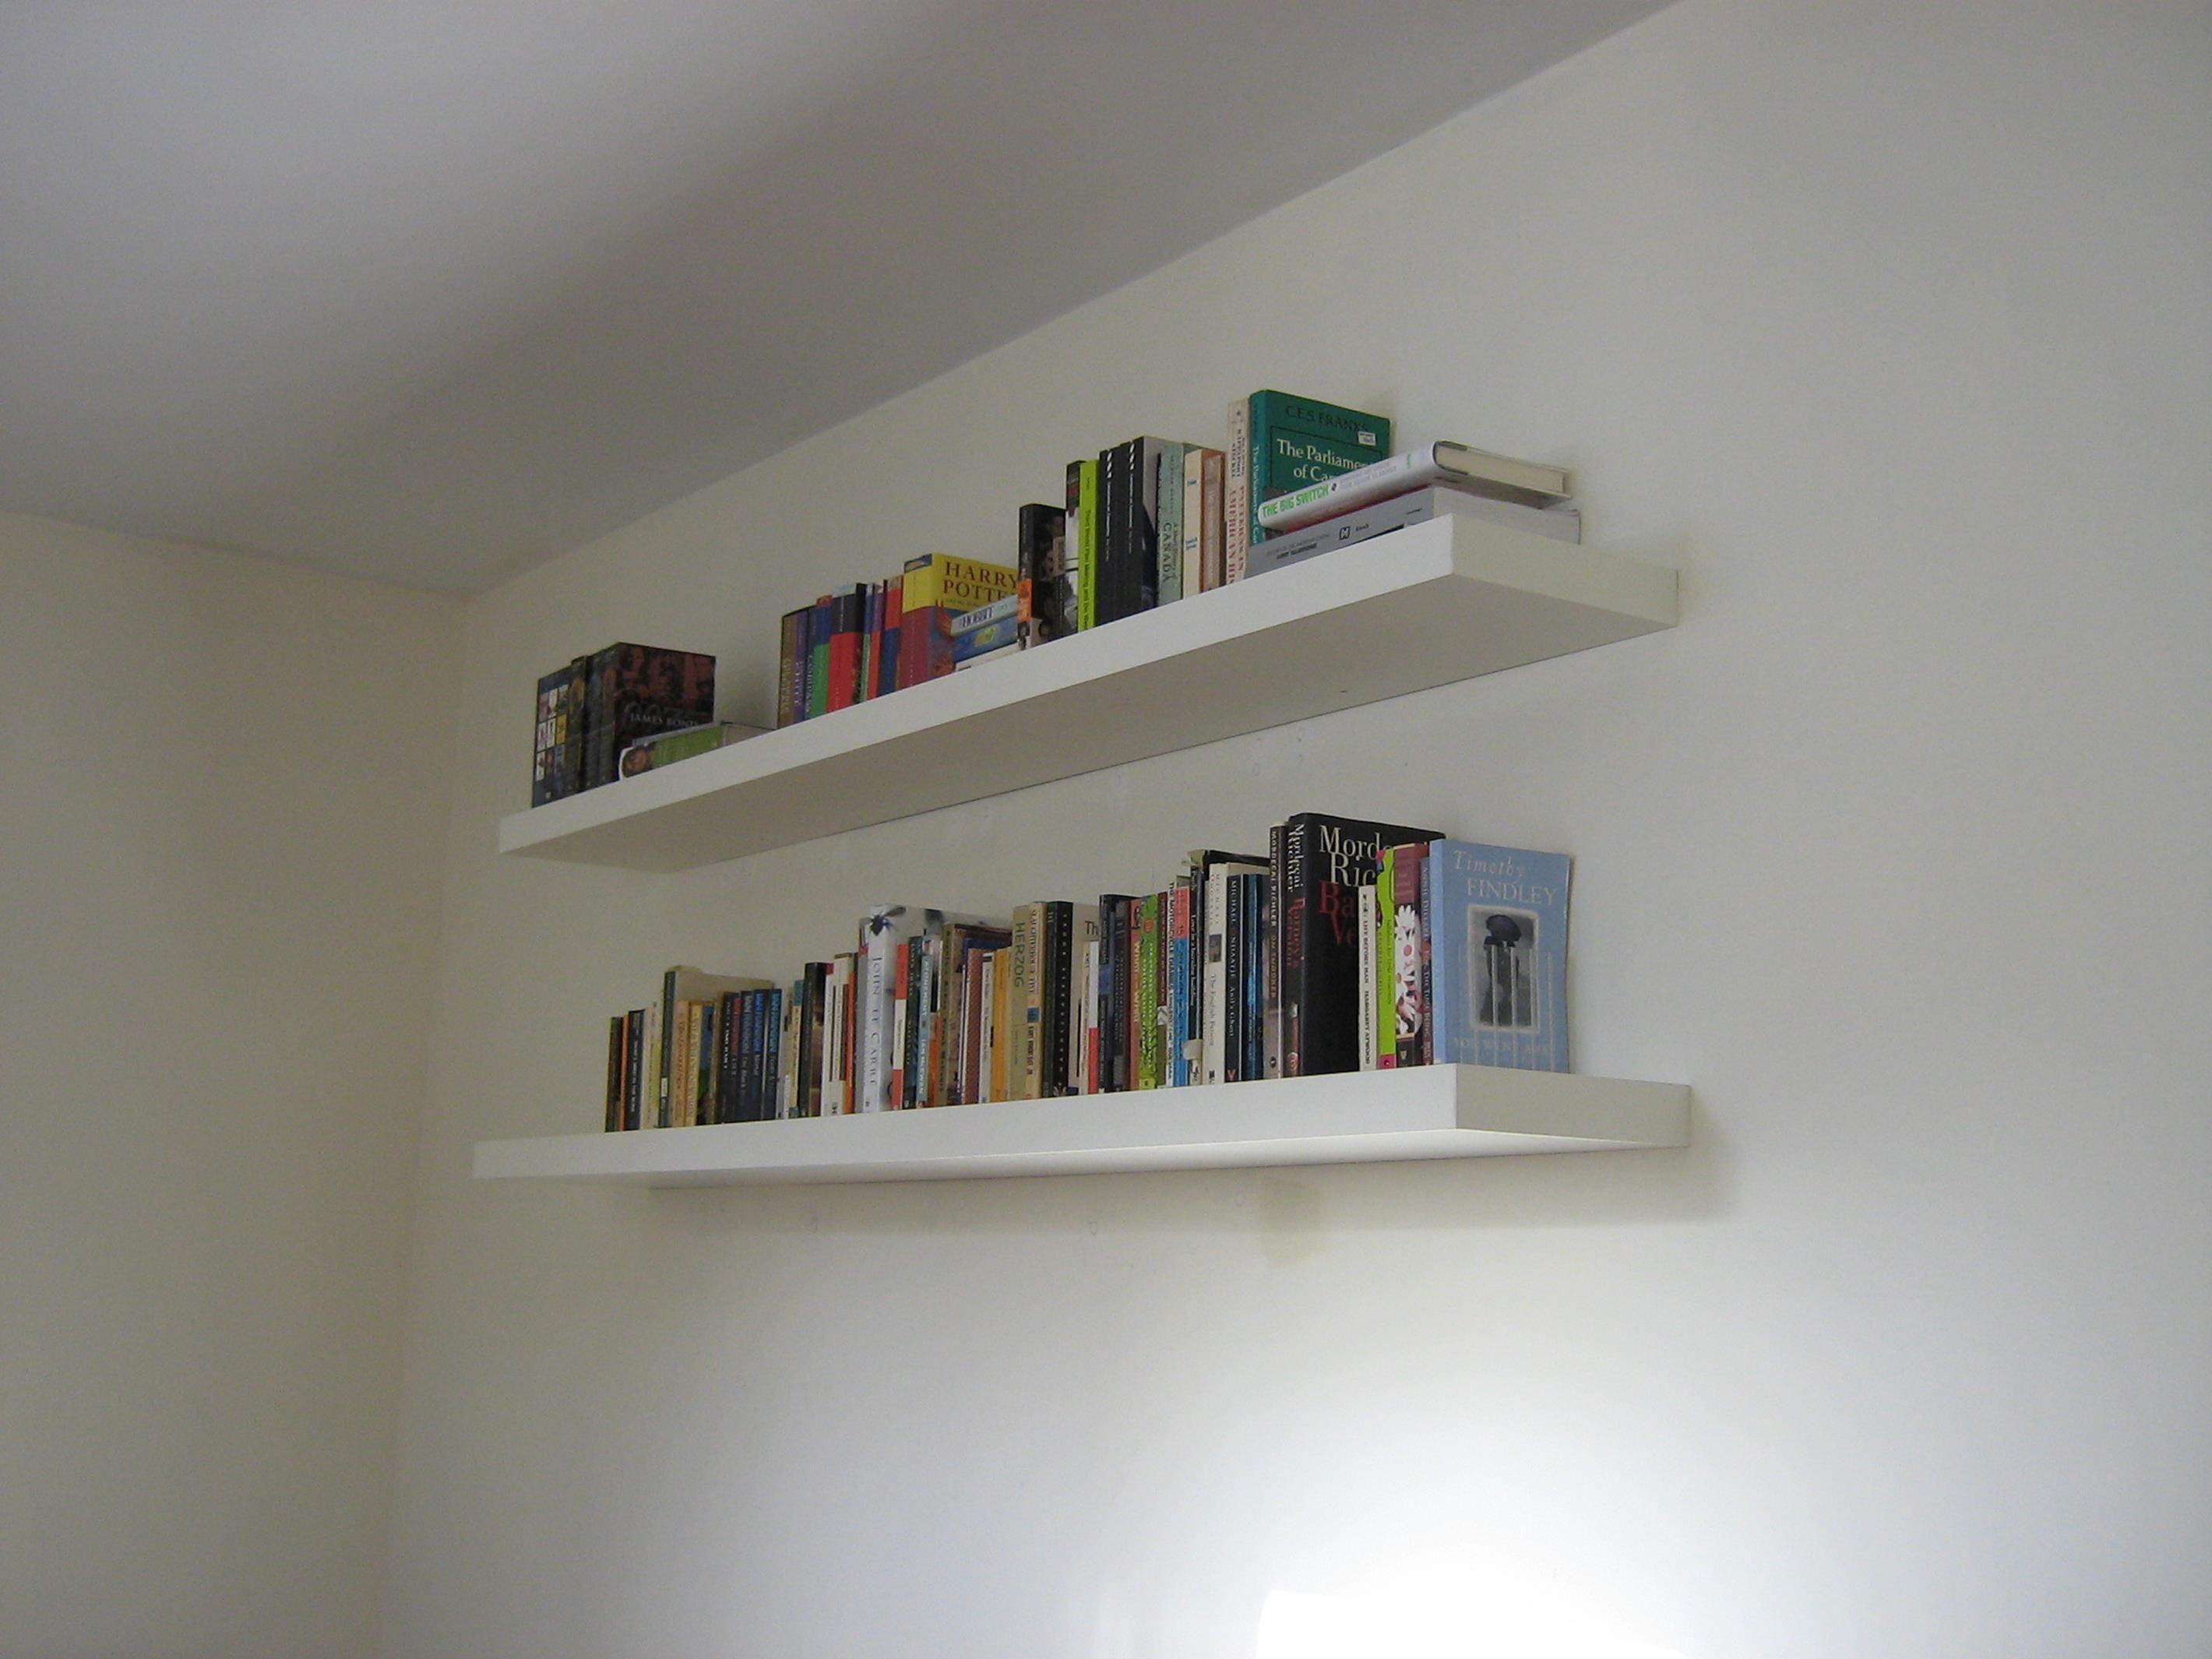 Best 30 Unique Cheap Ikea Floating Bookshelves Ideas Decorewarding Wall Bookshelves Wall Shelves Wooden Wall Shelves